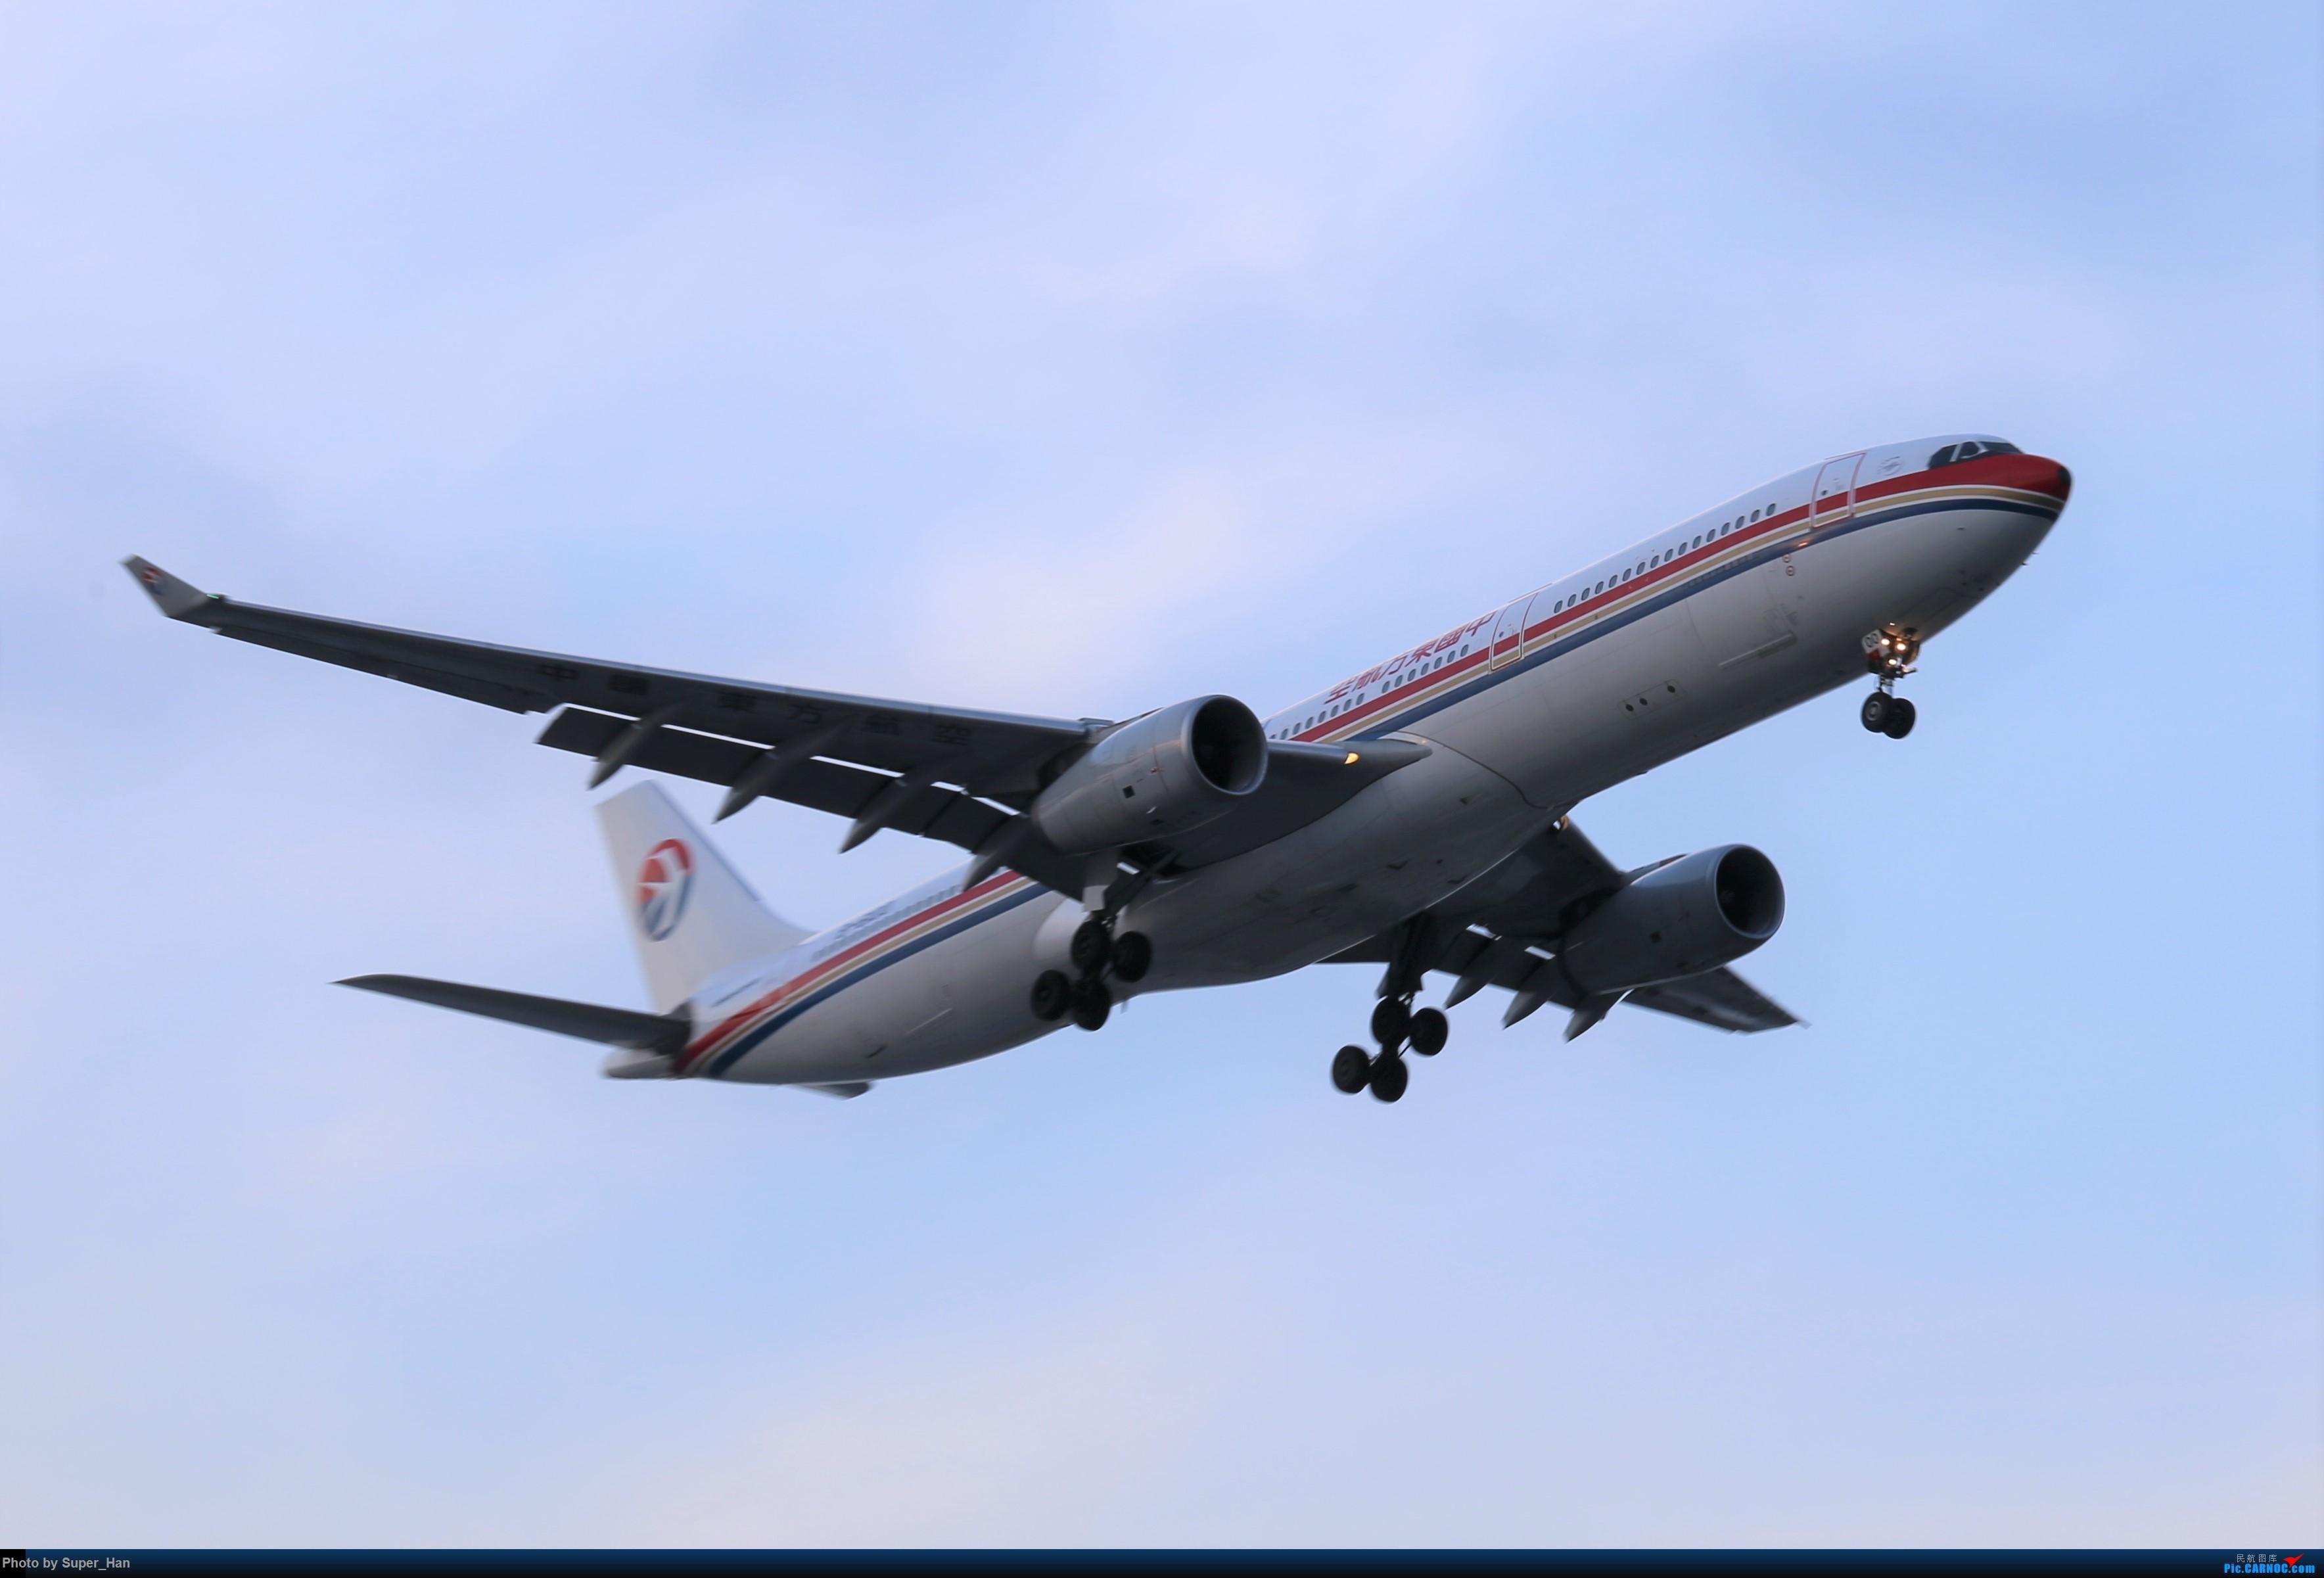 Re:[原创]0715去虹桥说走就走【最多的330篇】 AIRBUS A330-300 B-6100 中国上海虹桥国际机场